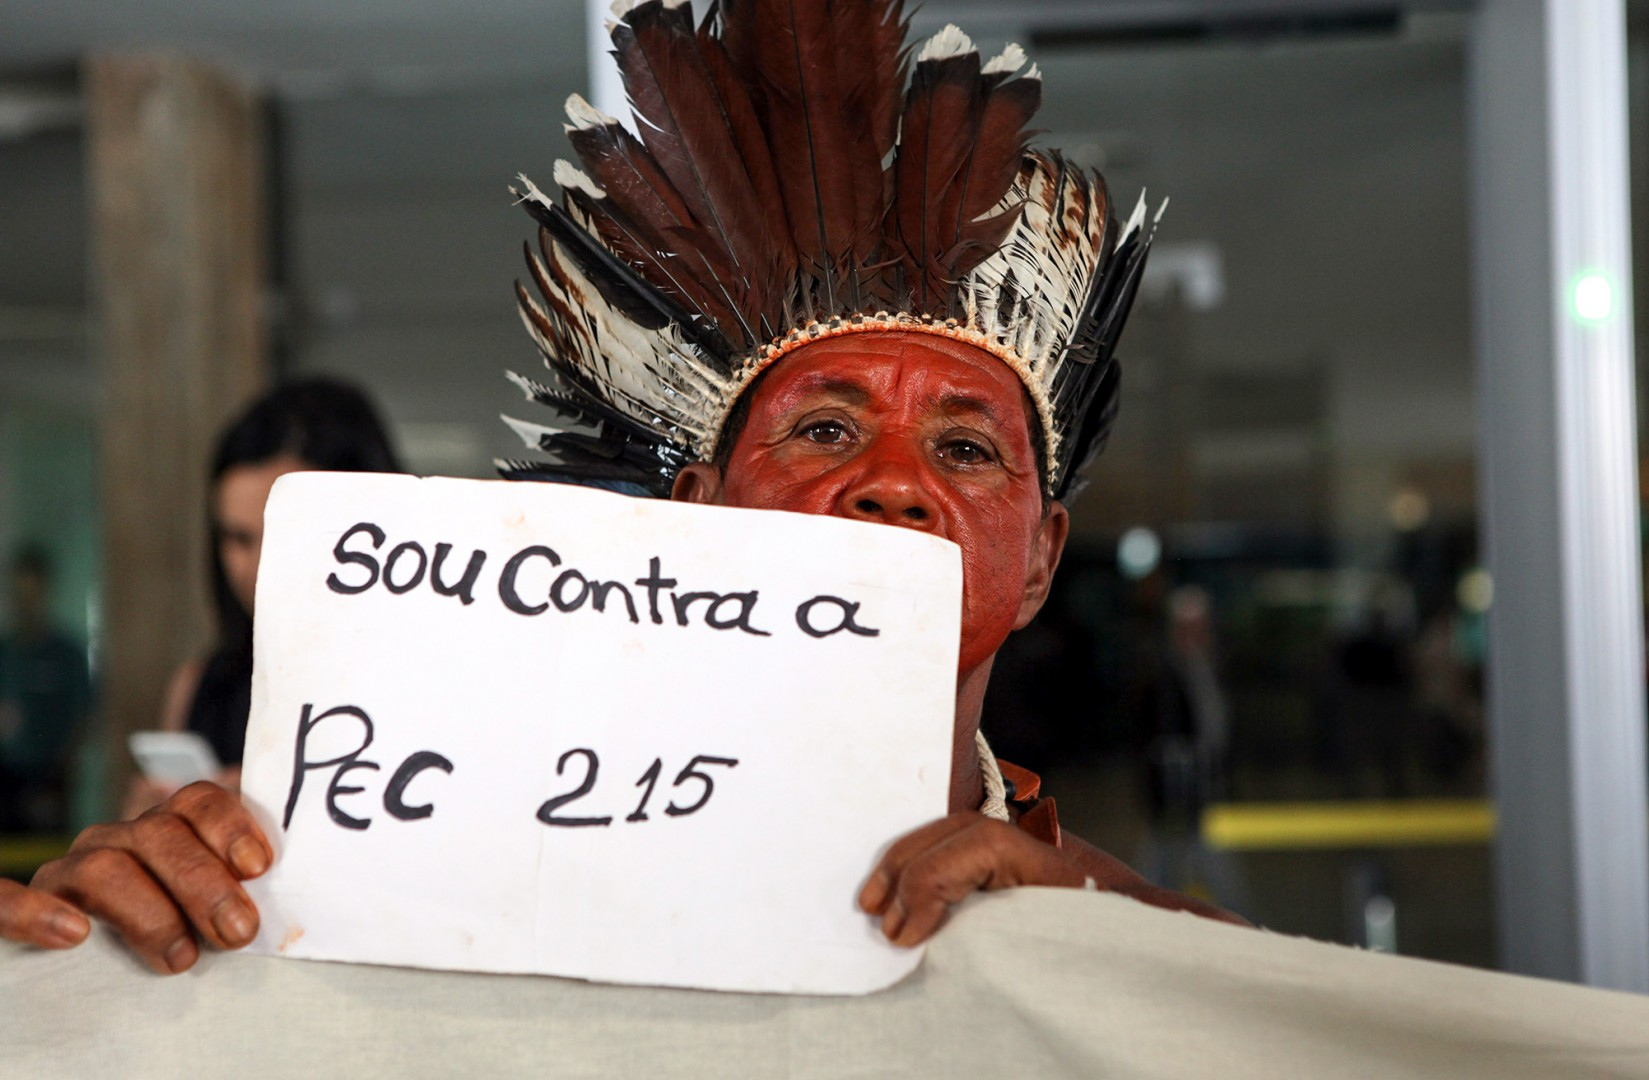 Brasília- DF- Brasil- 17/03/2015- Índios protestam na Câmara. Foto: Antonio Araújo/ Câmara dos Deputados